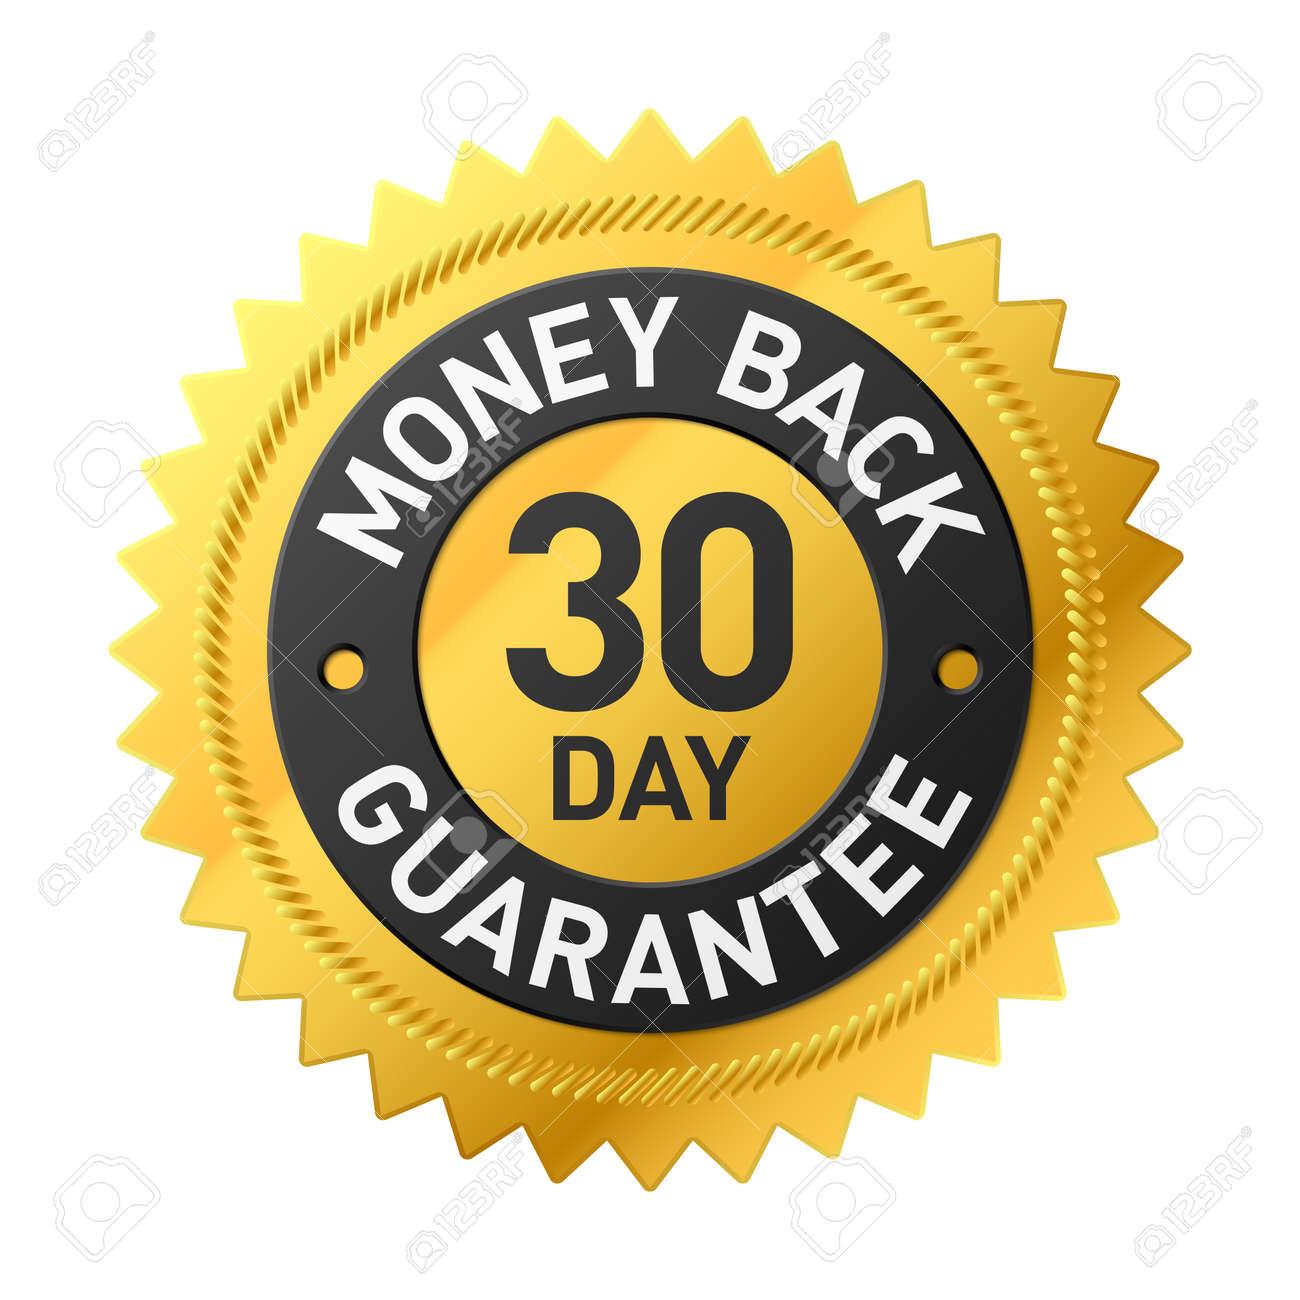 30 day money back guarantee label - 69055042